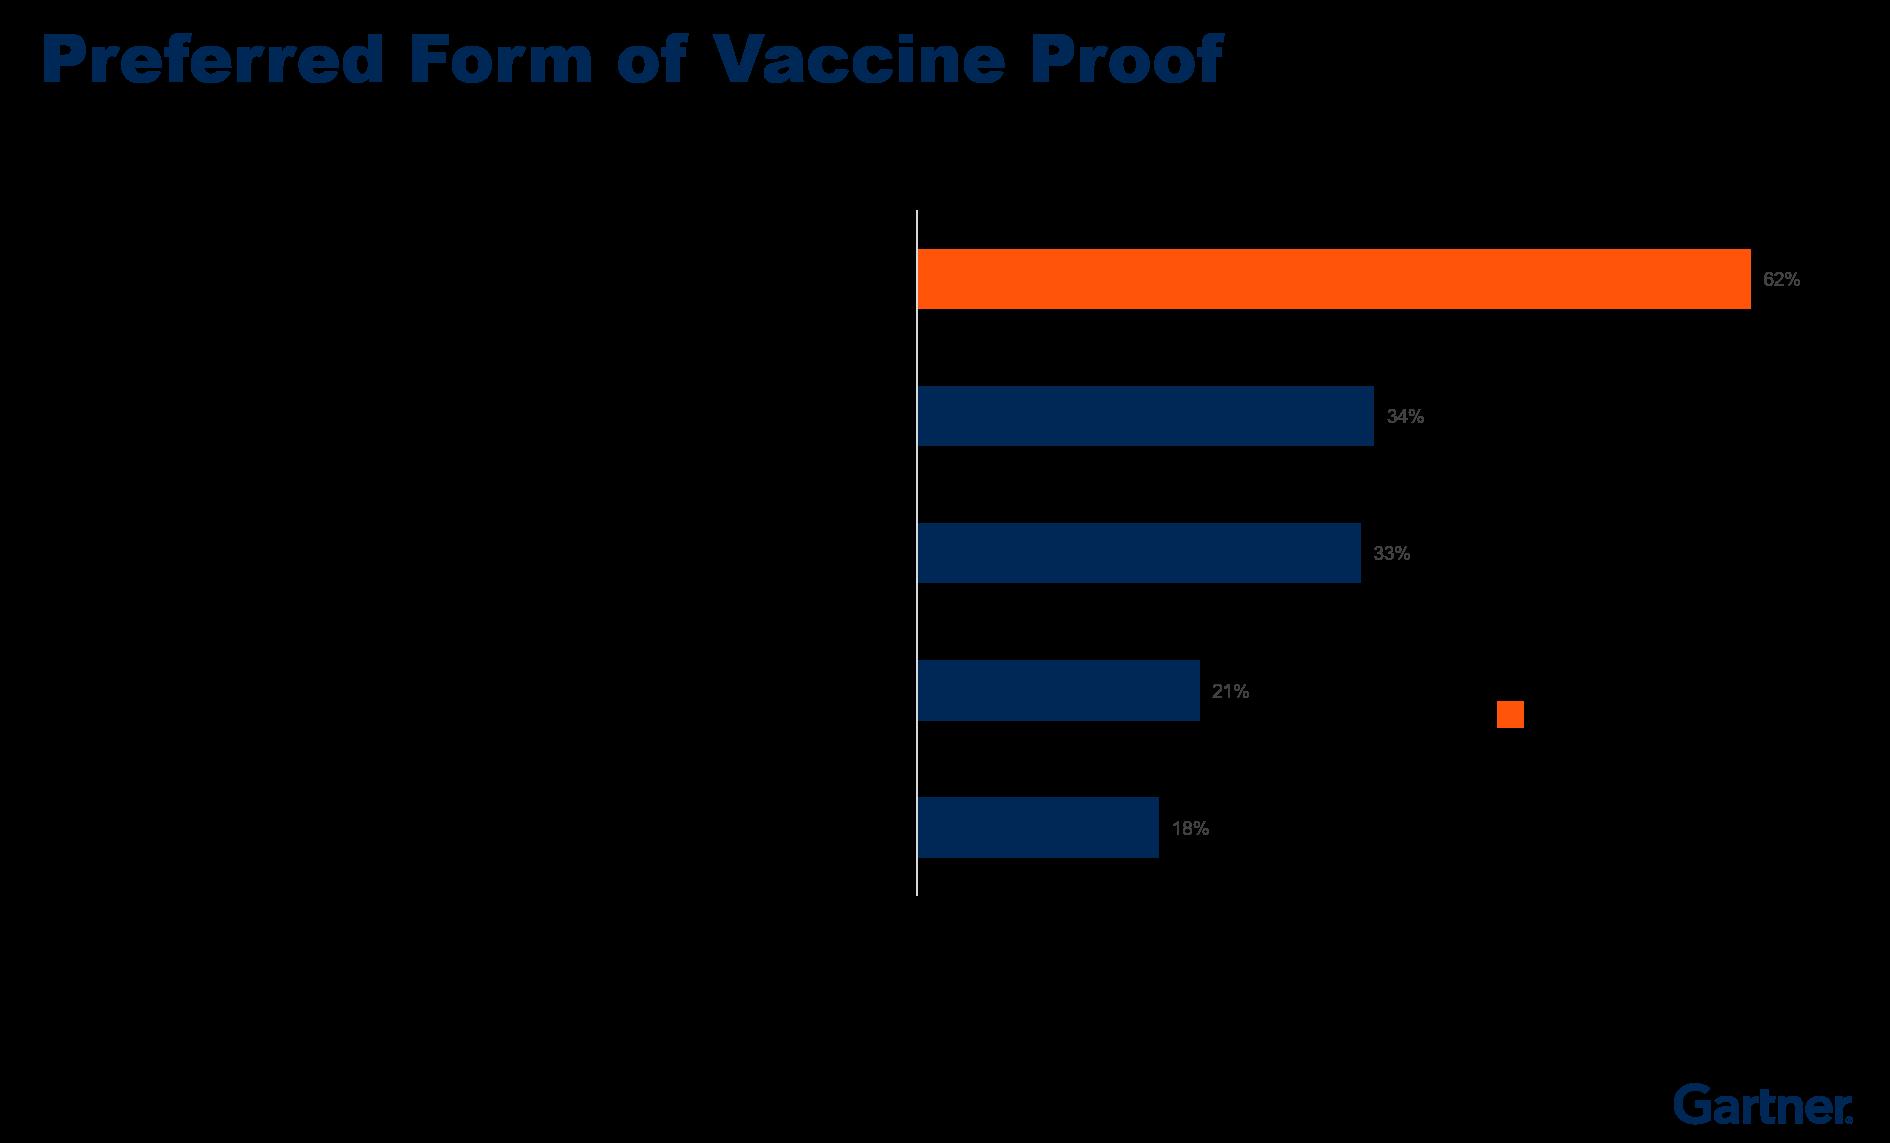 Figure 5. Preferred Form of Vaccine Proof